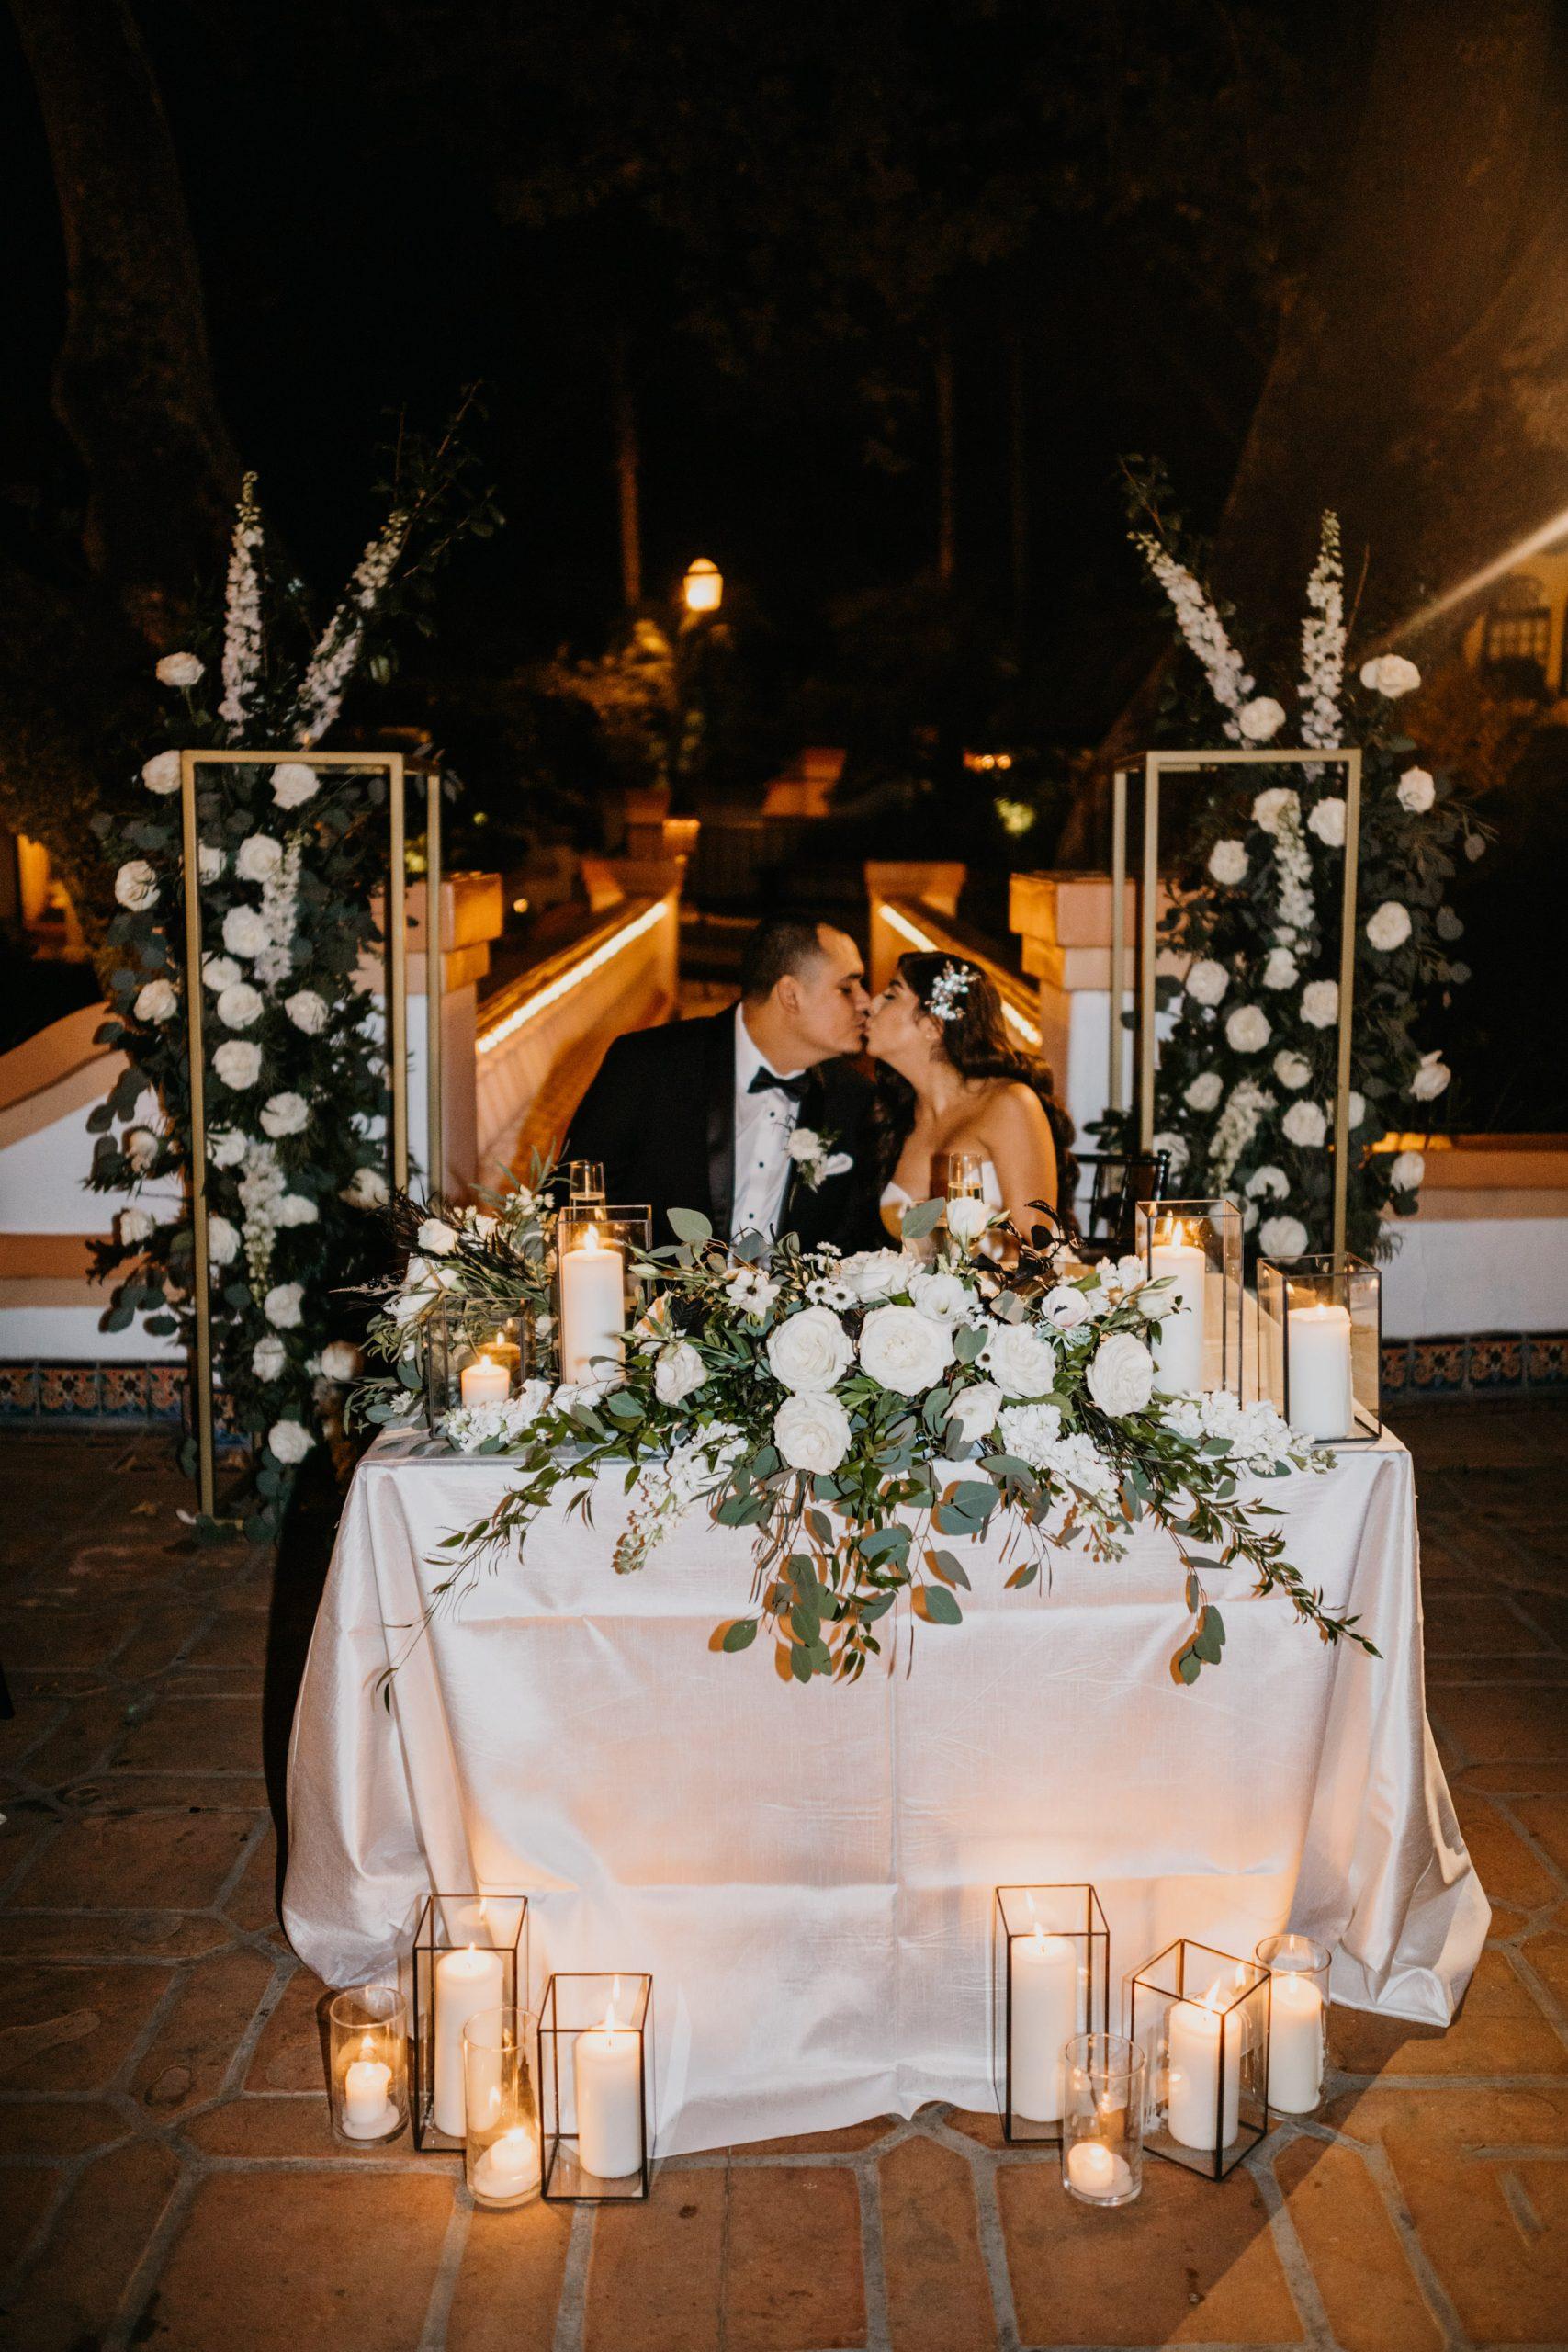 Rancho Las Lomas Wedding Sweetheart Table, image by Fatima Elreda Photo